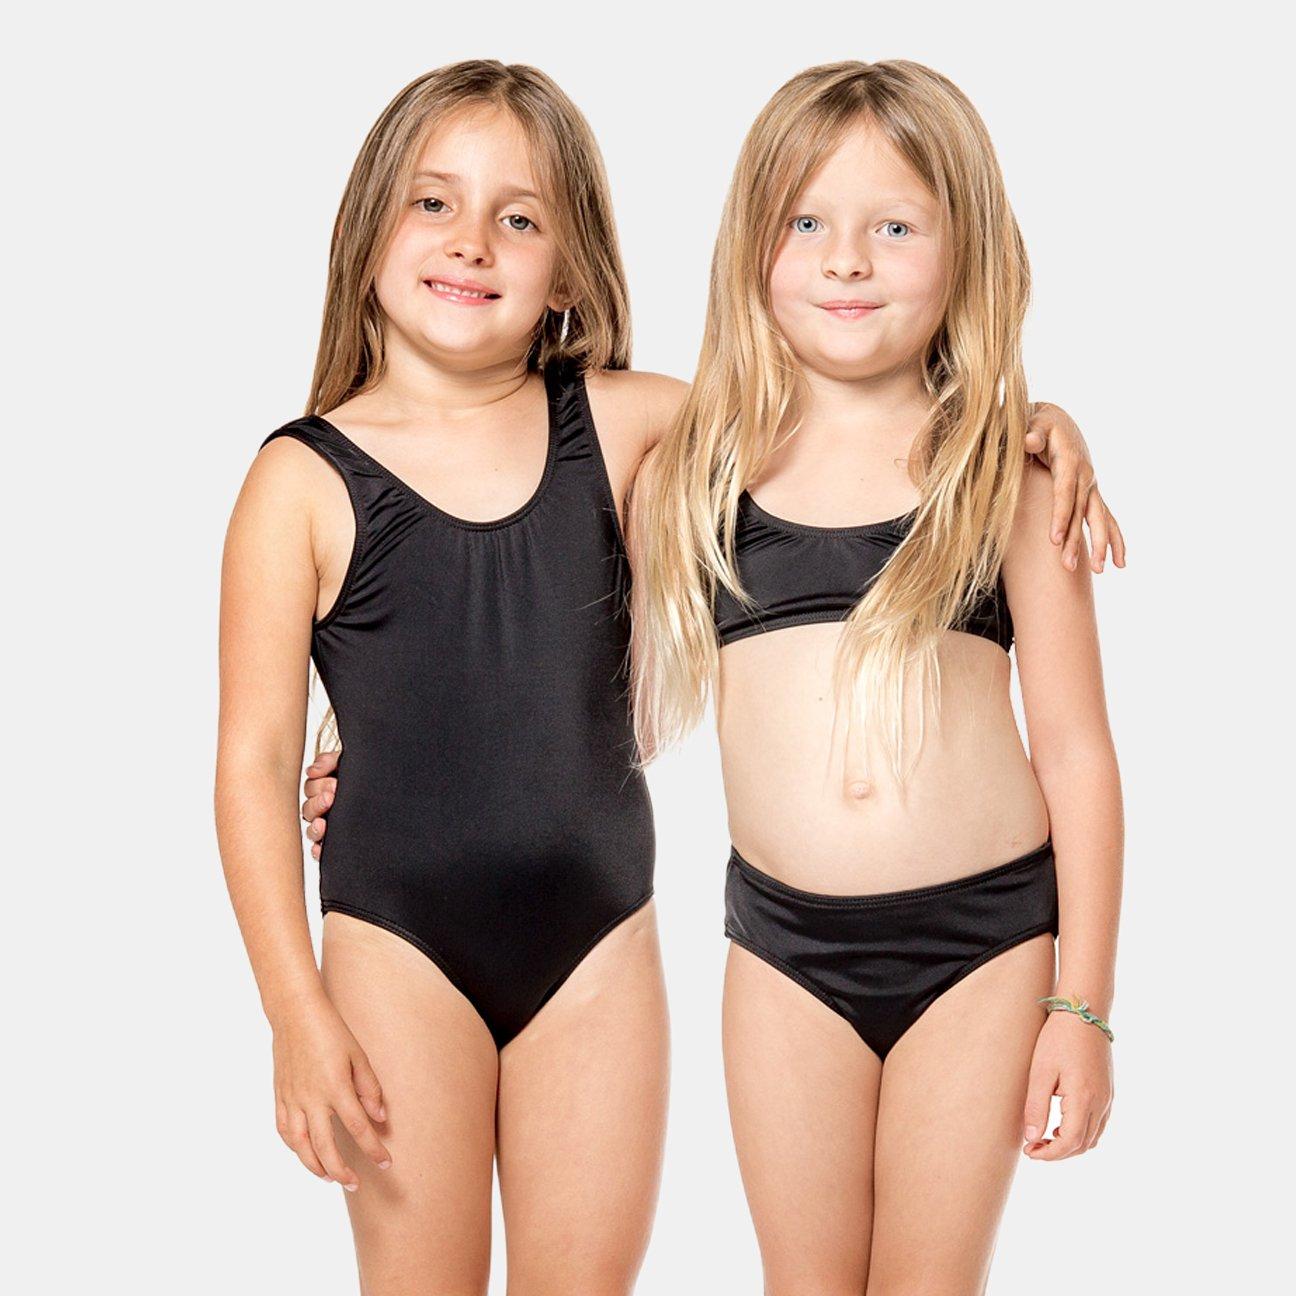 identical-twin-little-girls-in-bikinis-latina-tits-vids